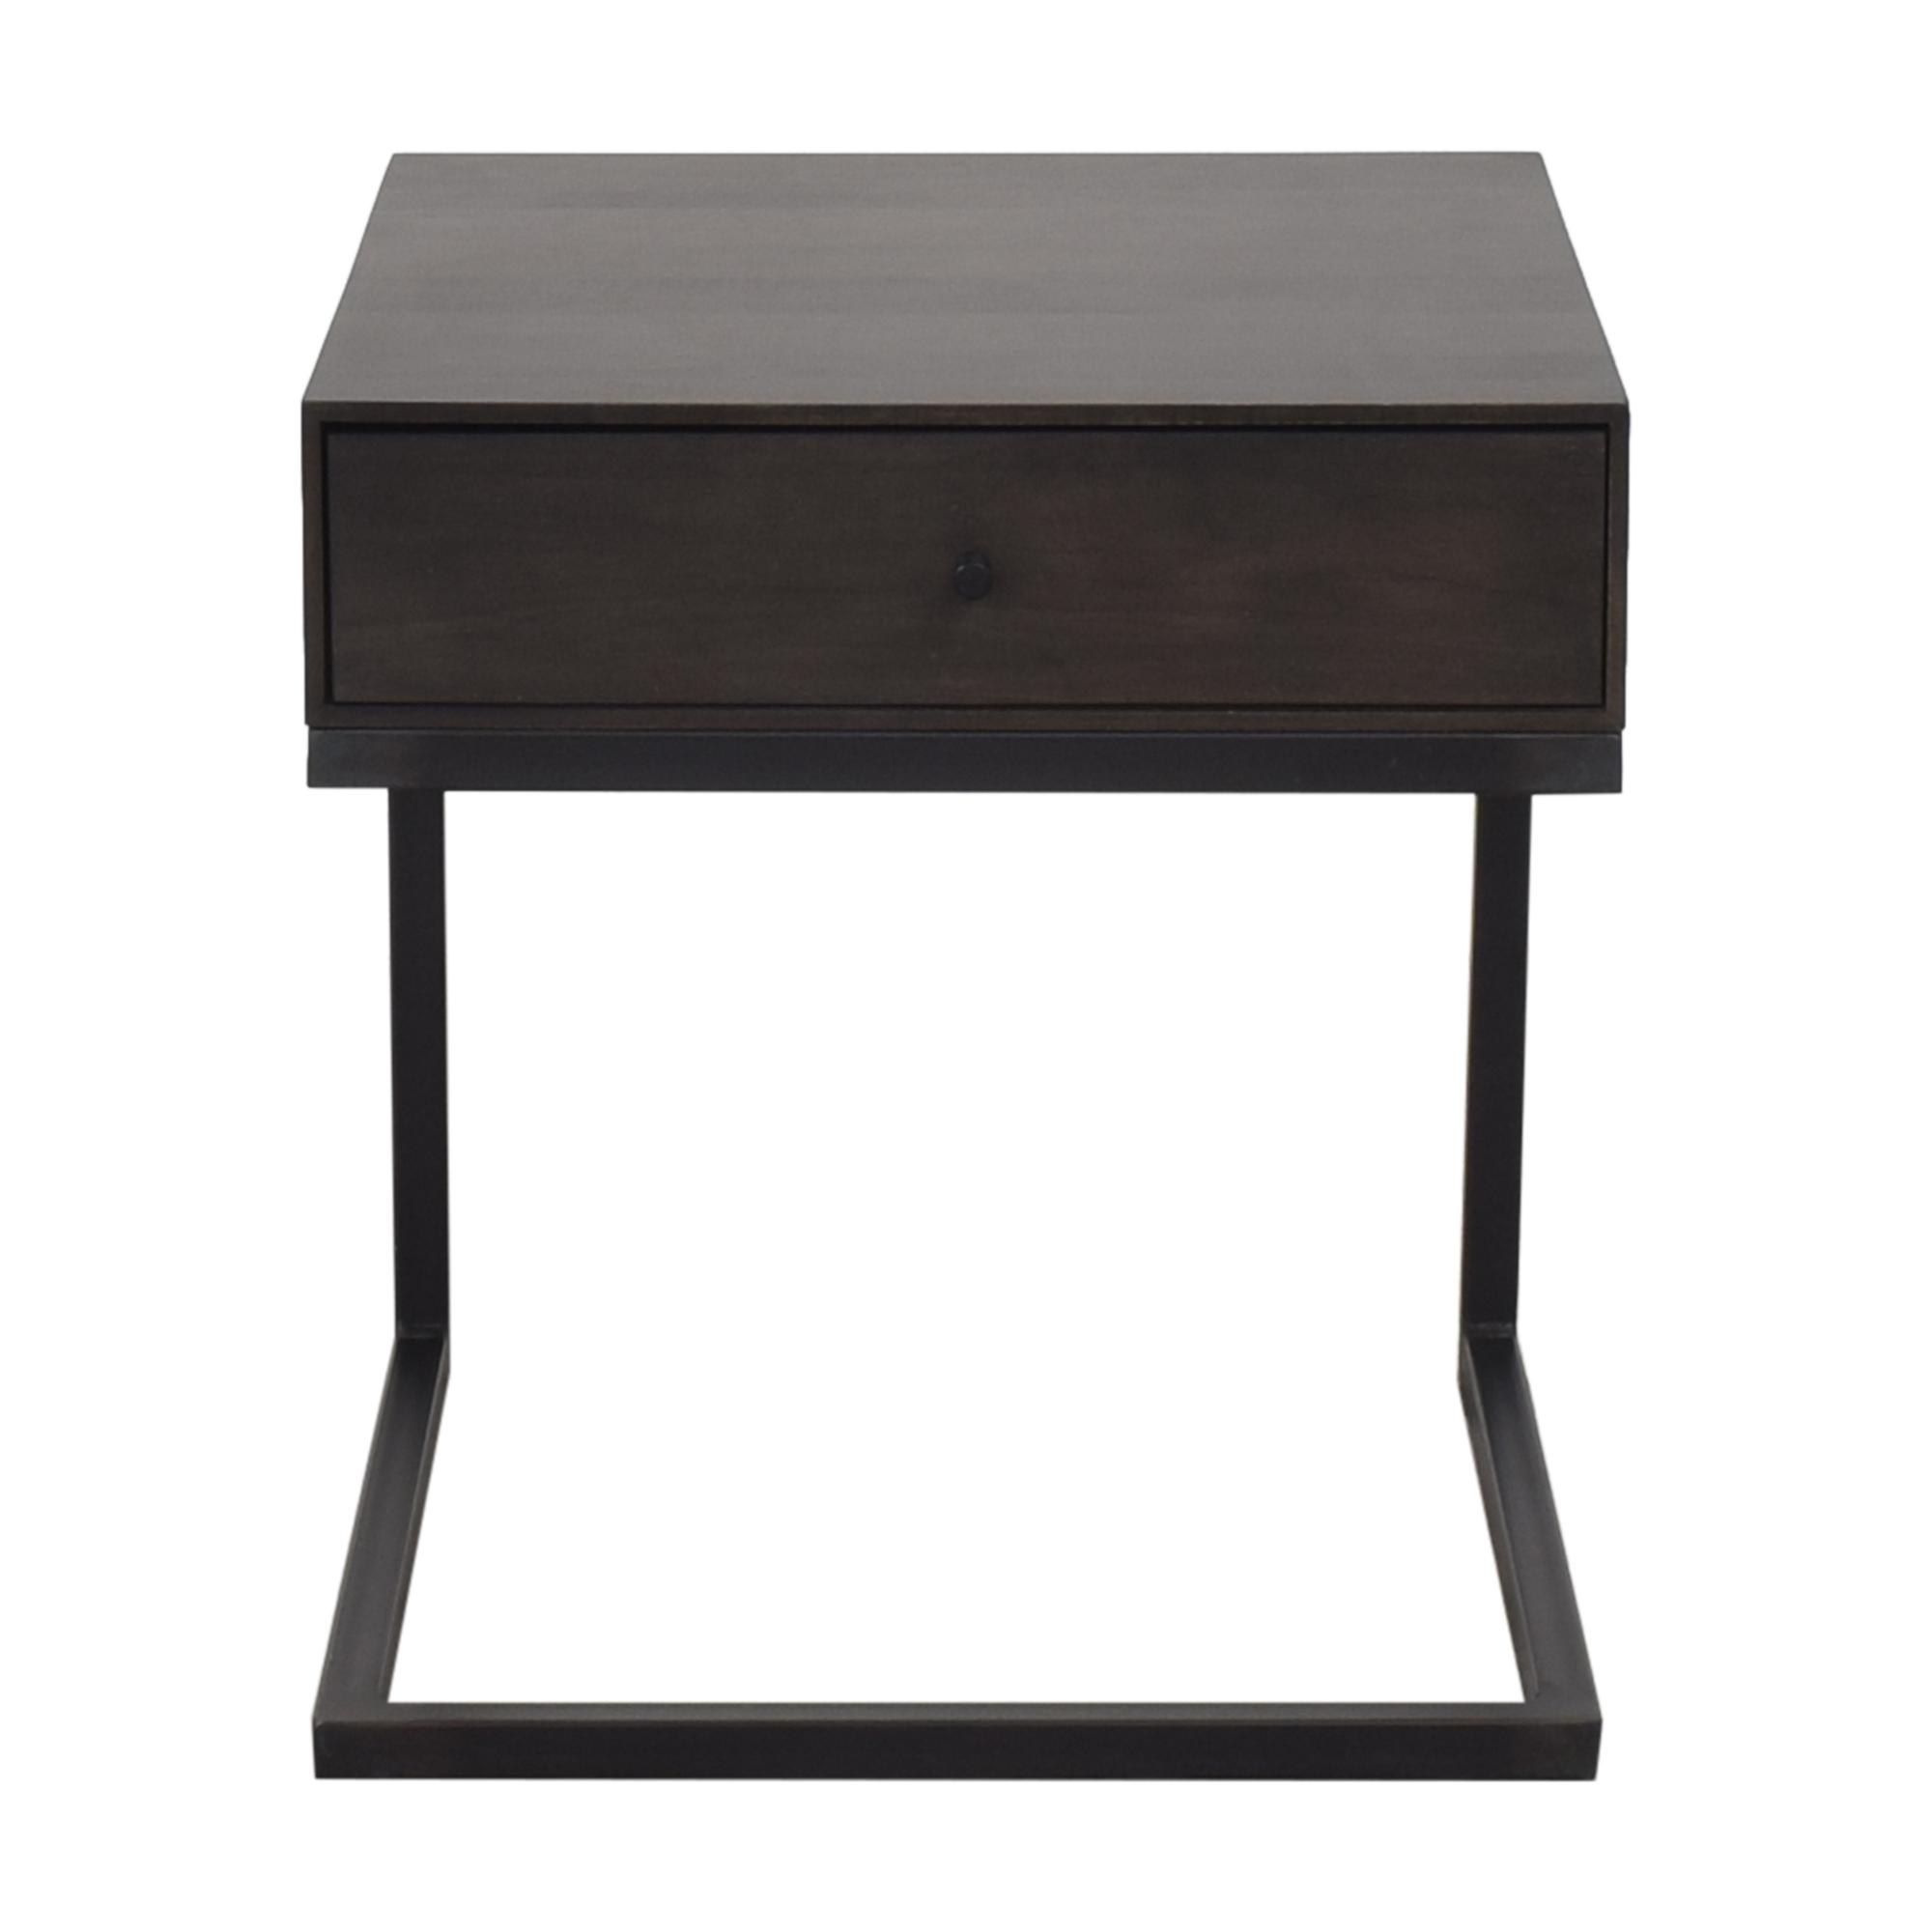 buy Room & Board Hudson One Drawer C-Table Nightstand Room & Board